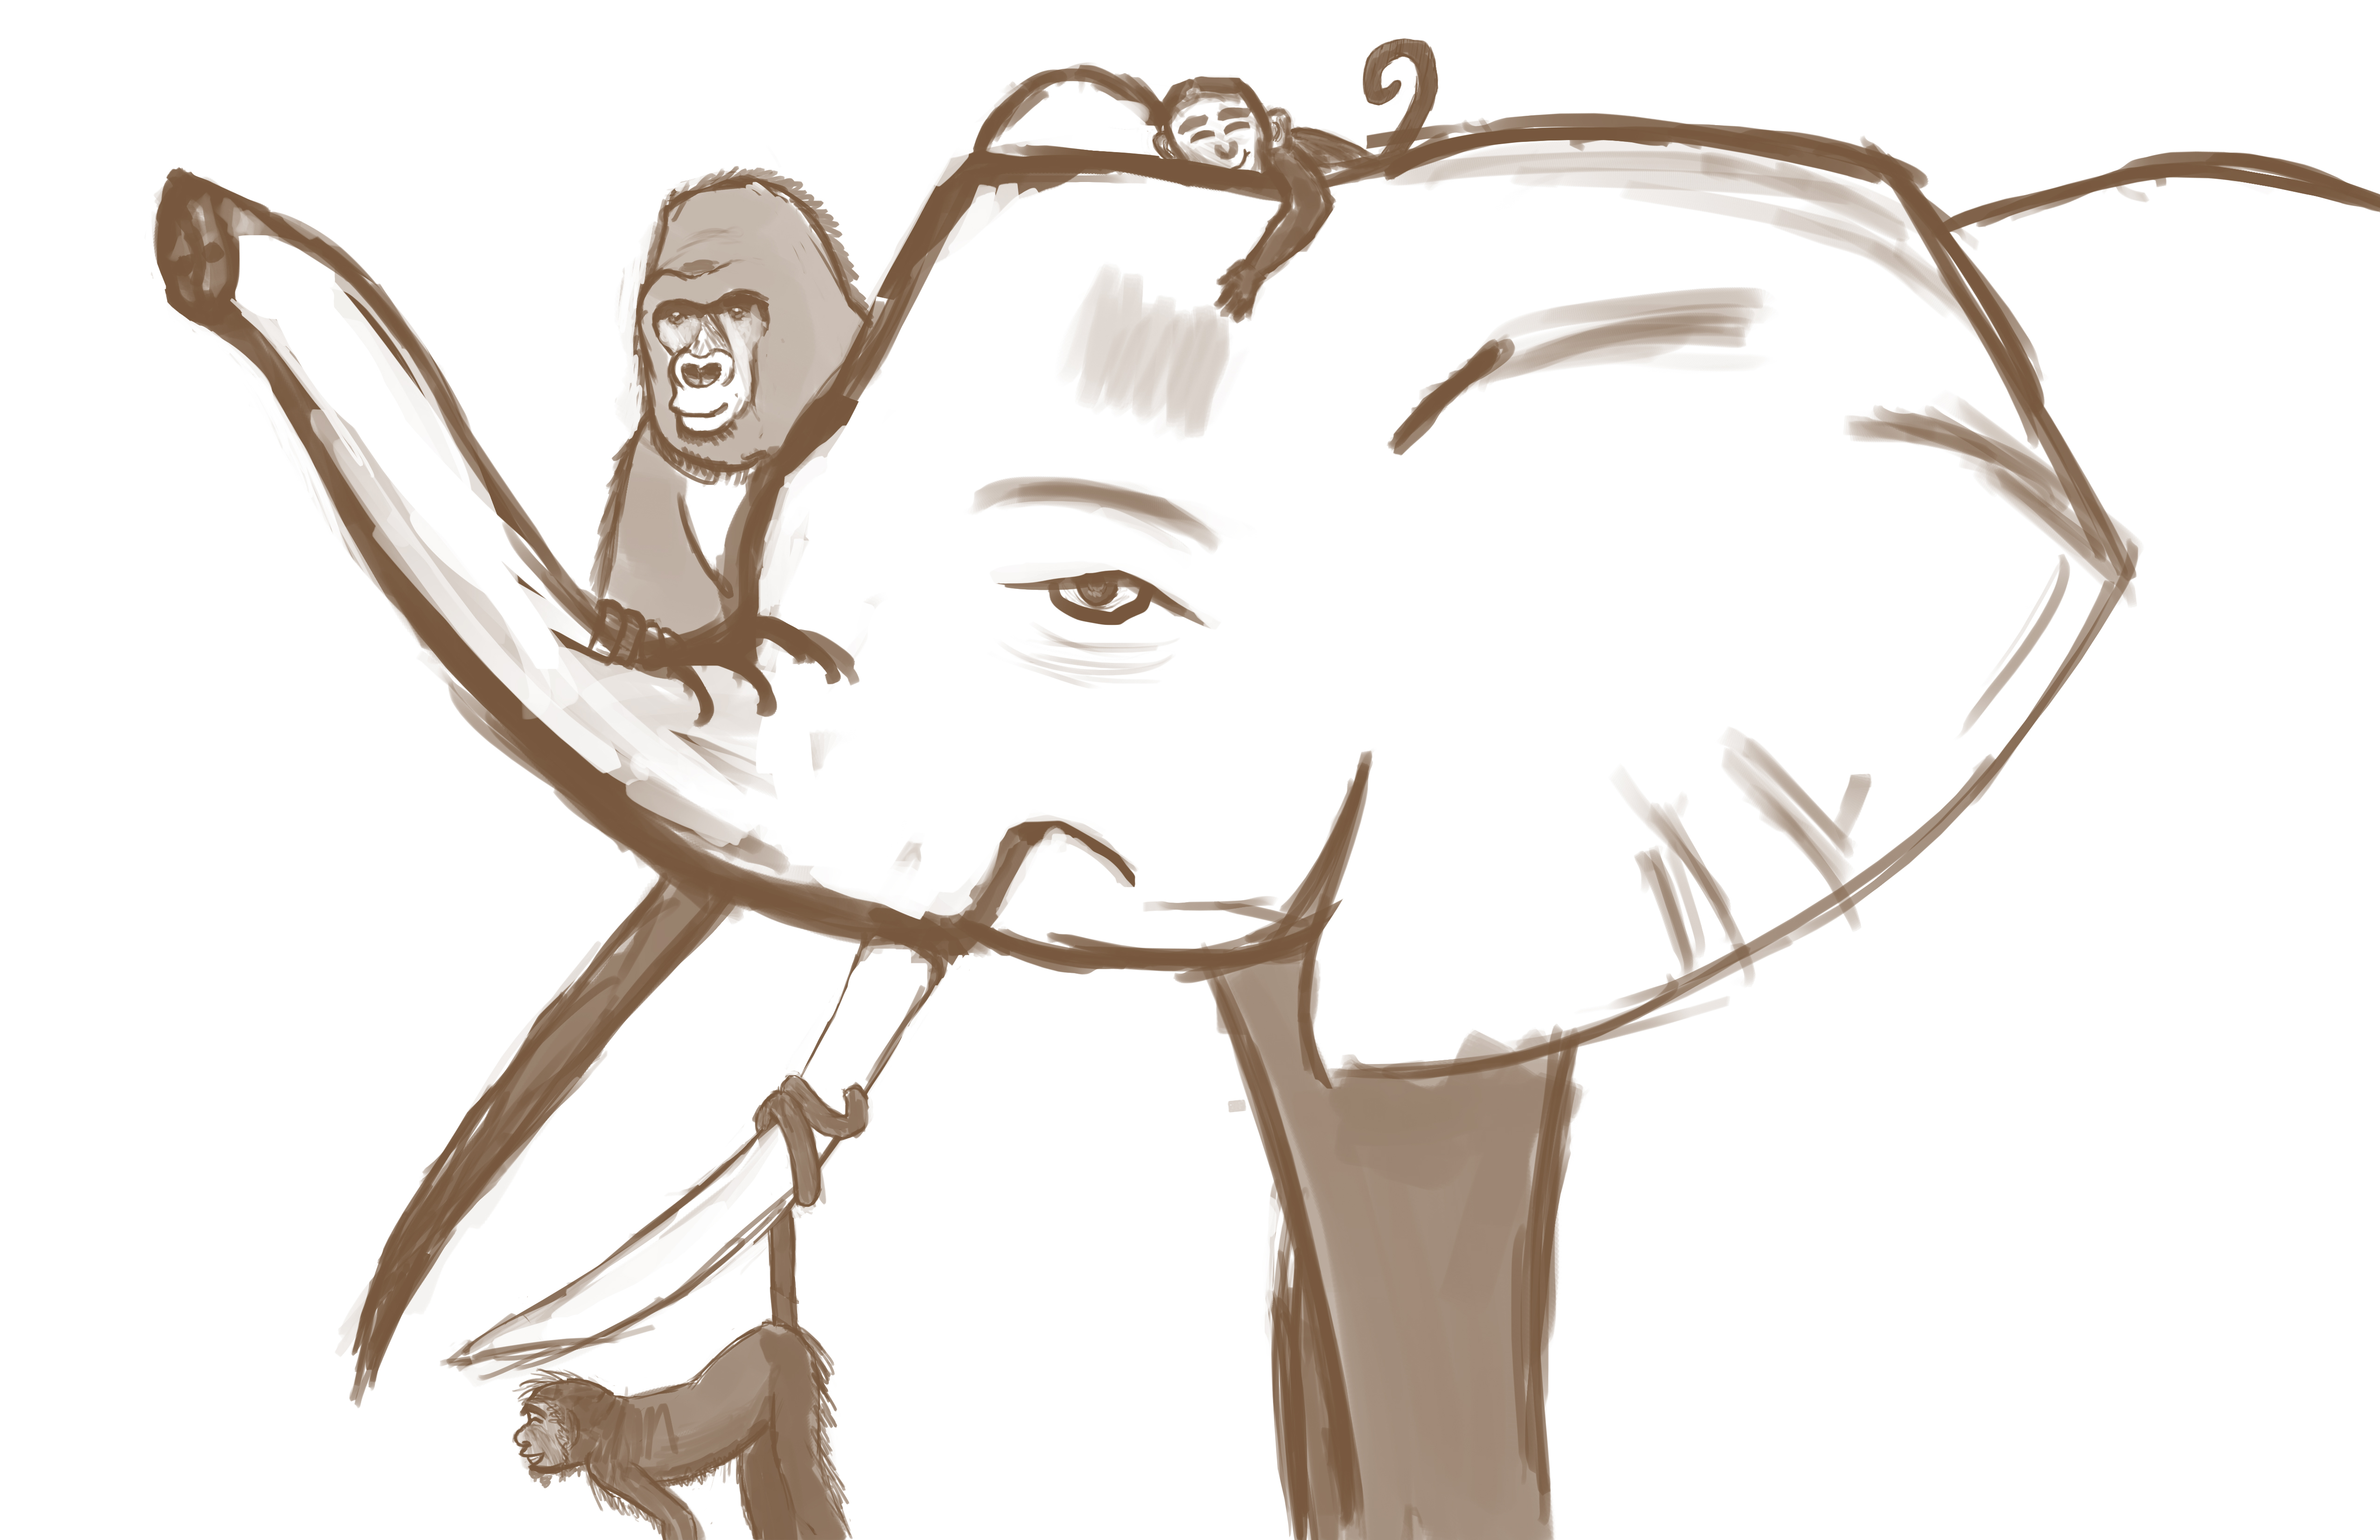 Perturbed Pachyderm